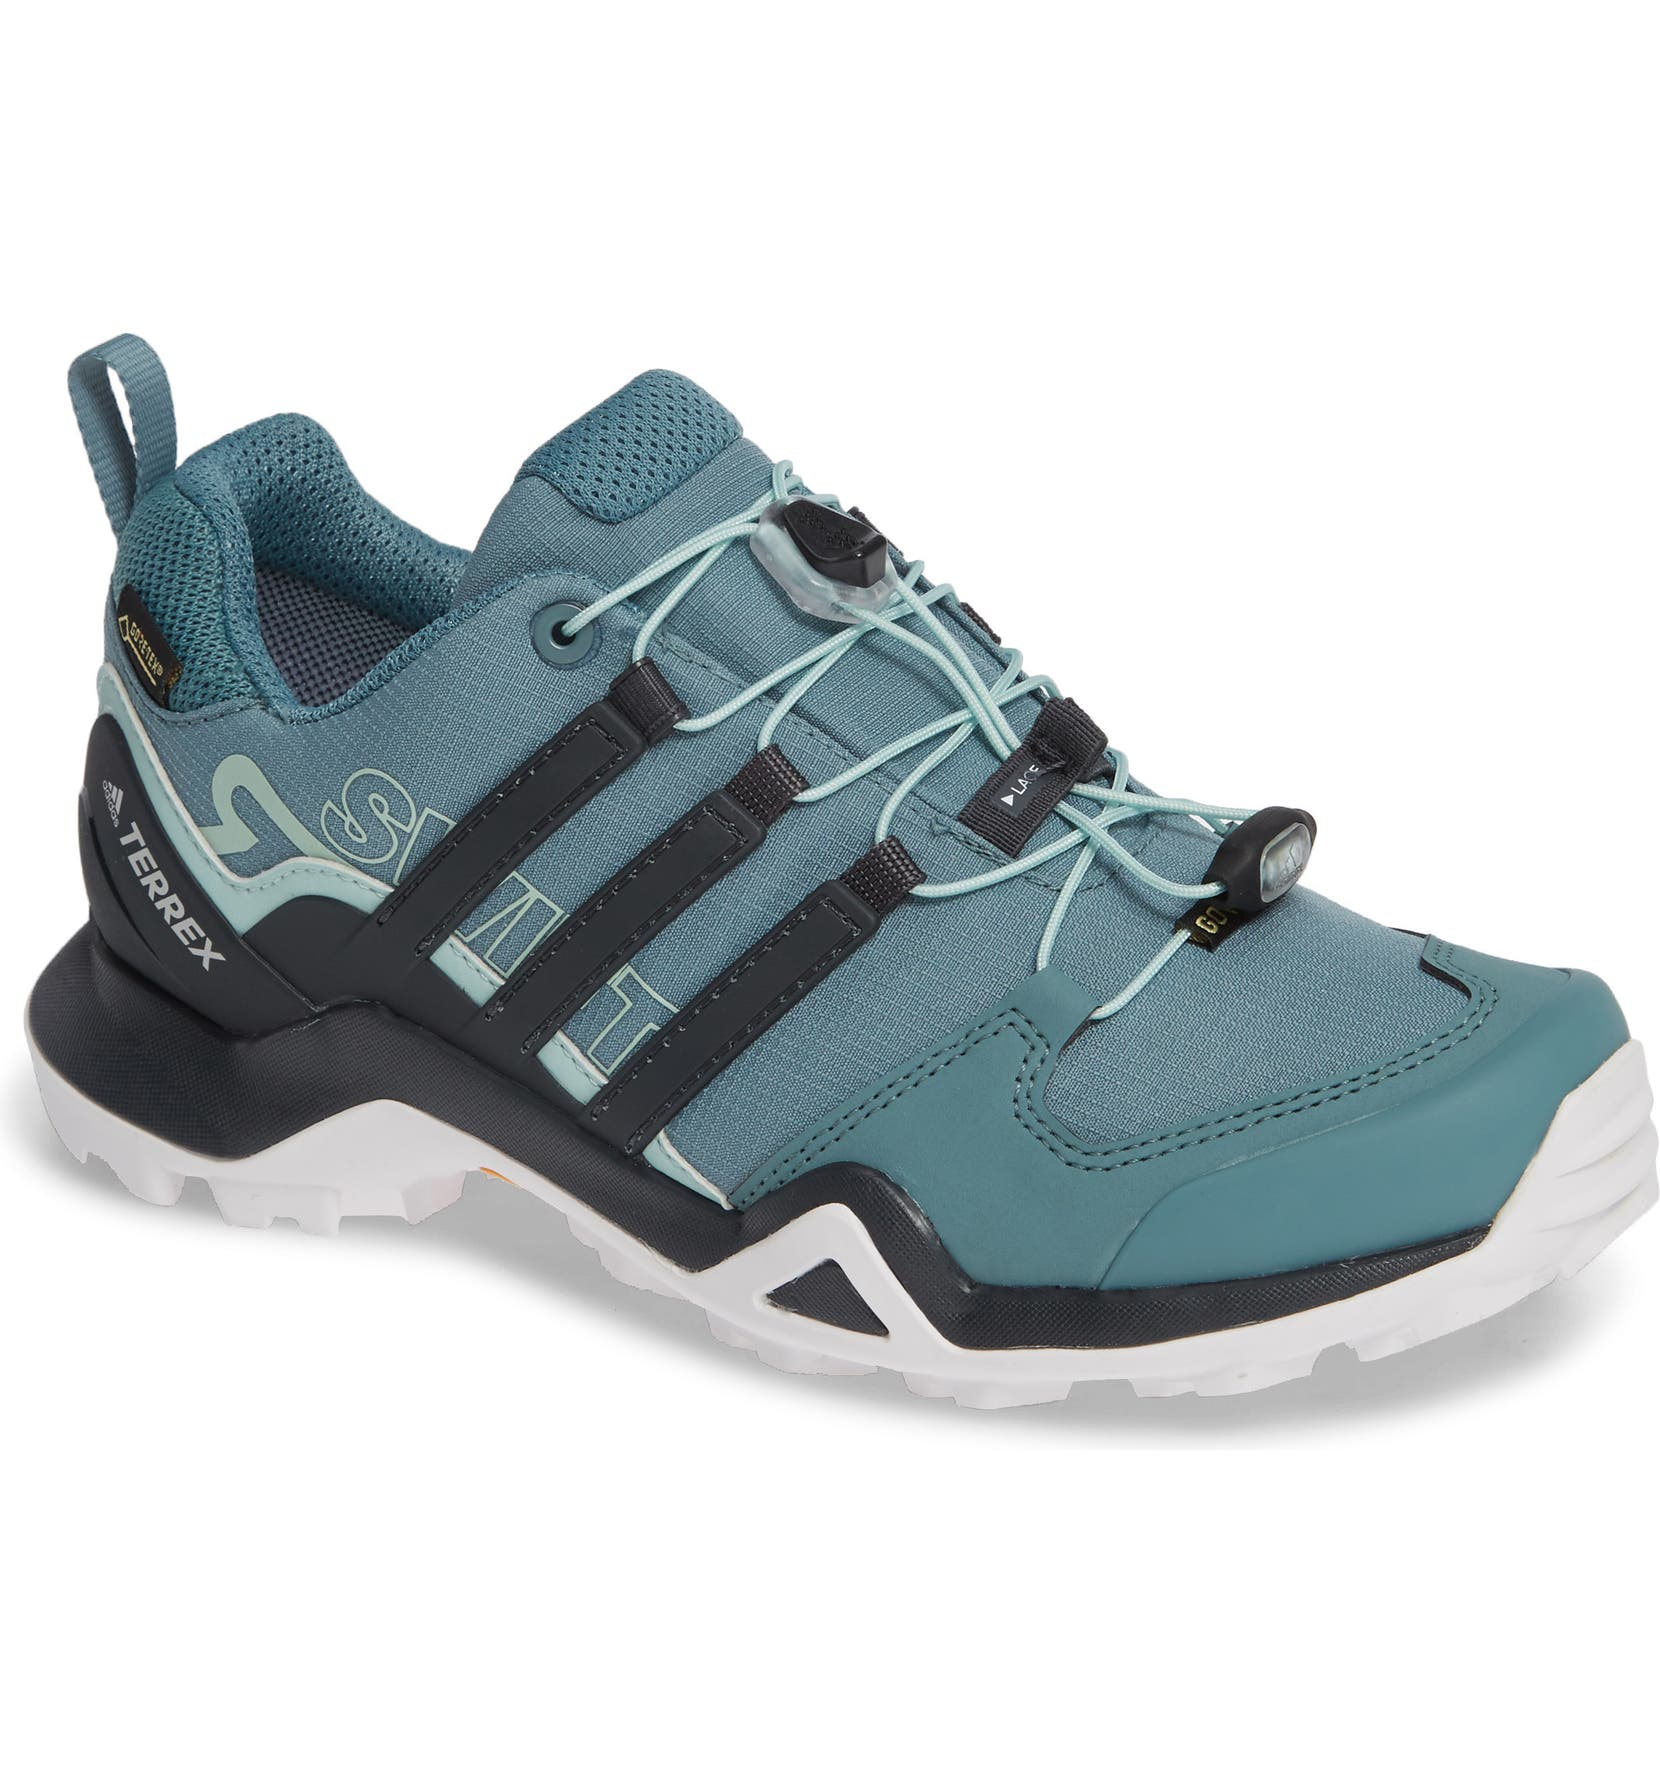 d9f68507921 adidas Terrex Swift R2 GTX Gore-Tex® Waterproof Hiking Shoe (Women ...